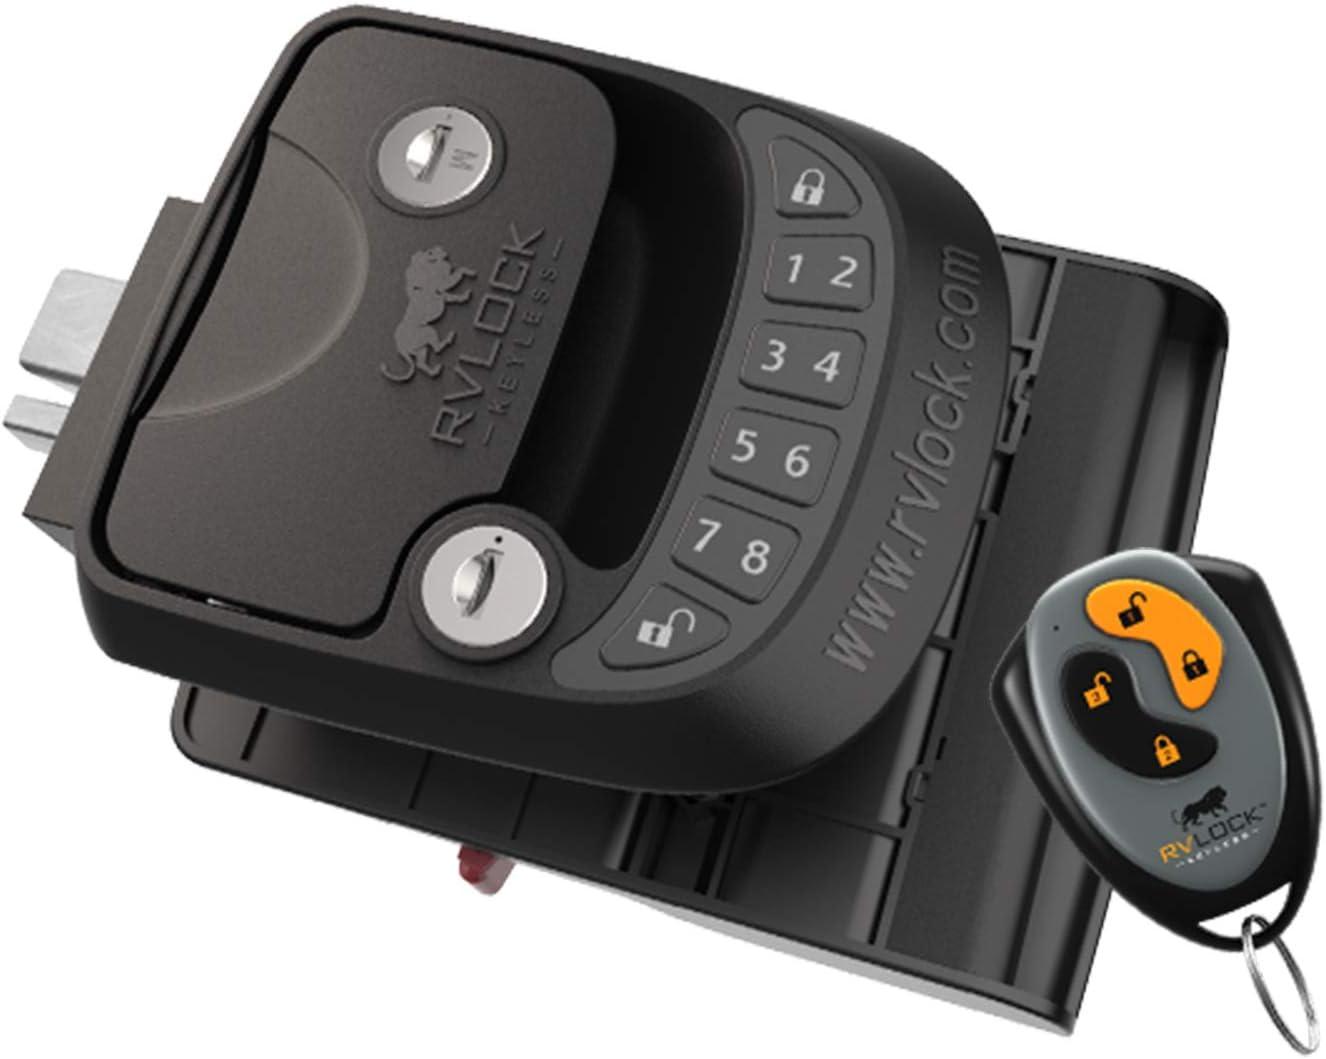 RVLock Key Fob and RH Compact Keyless RV Door Lock